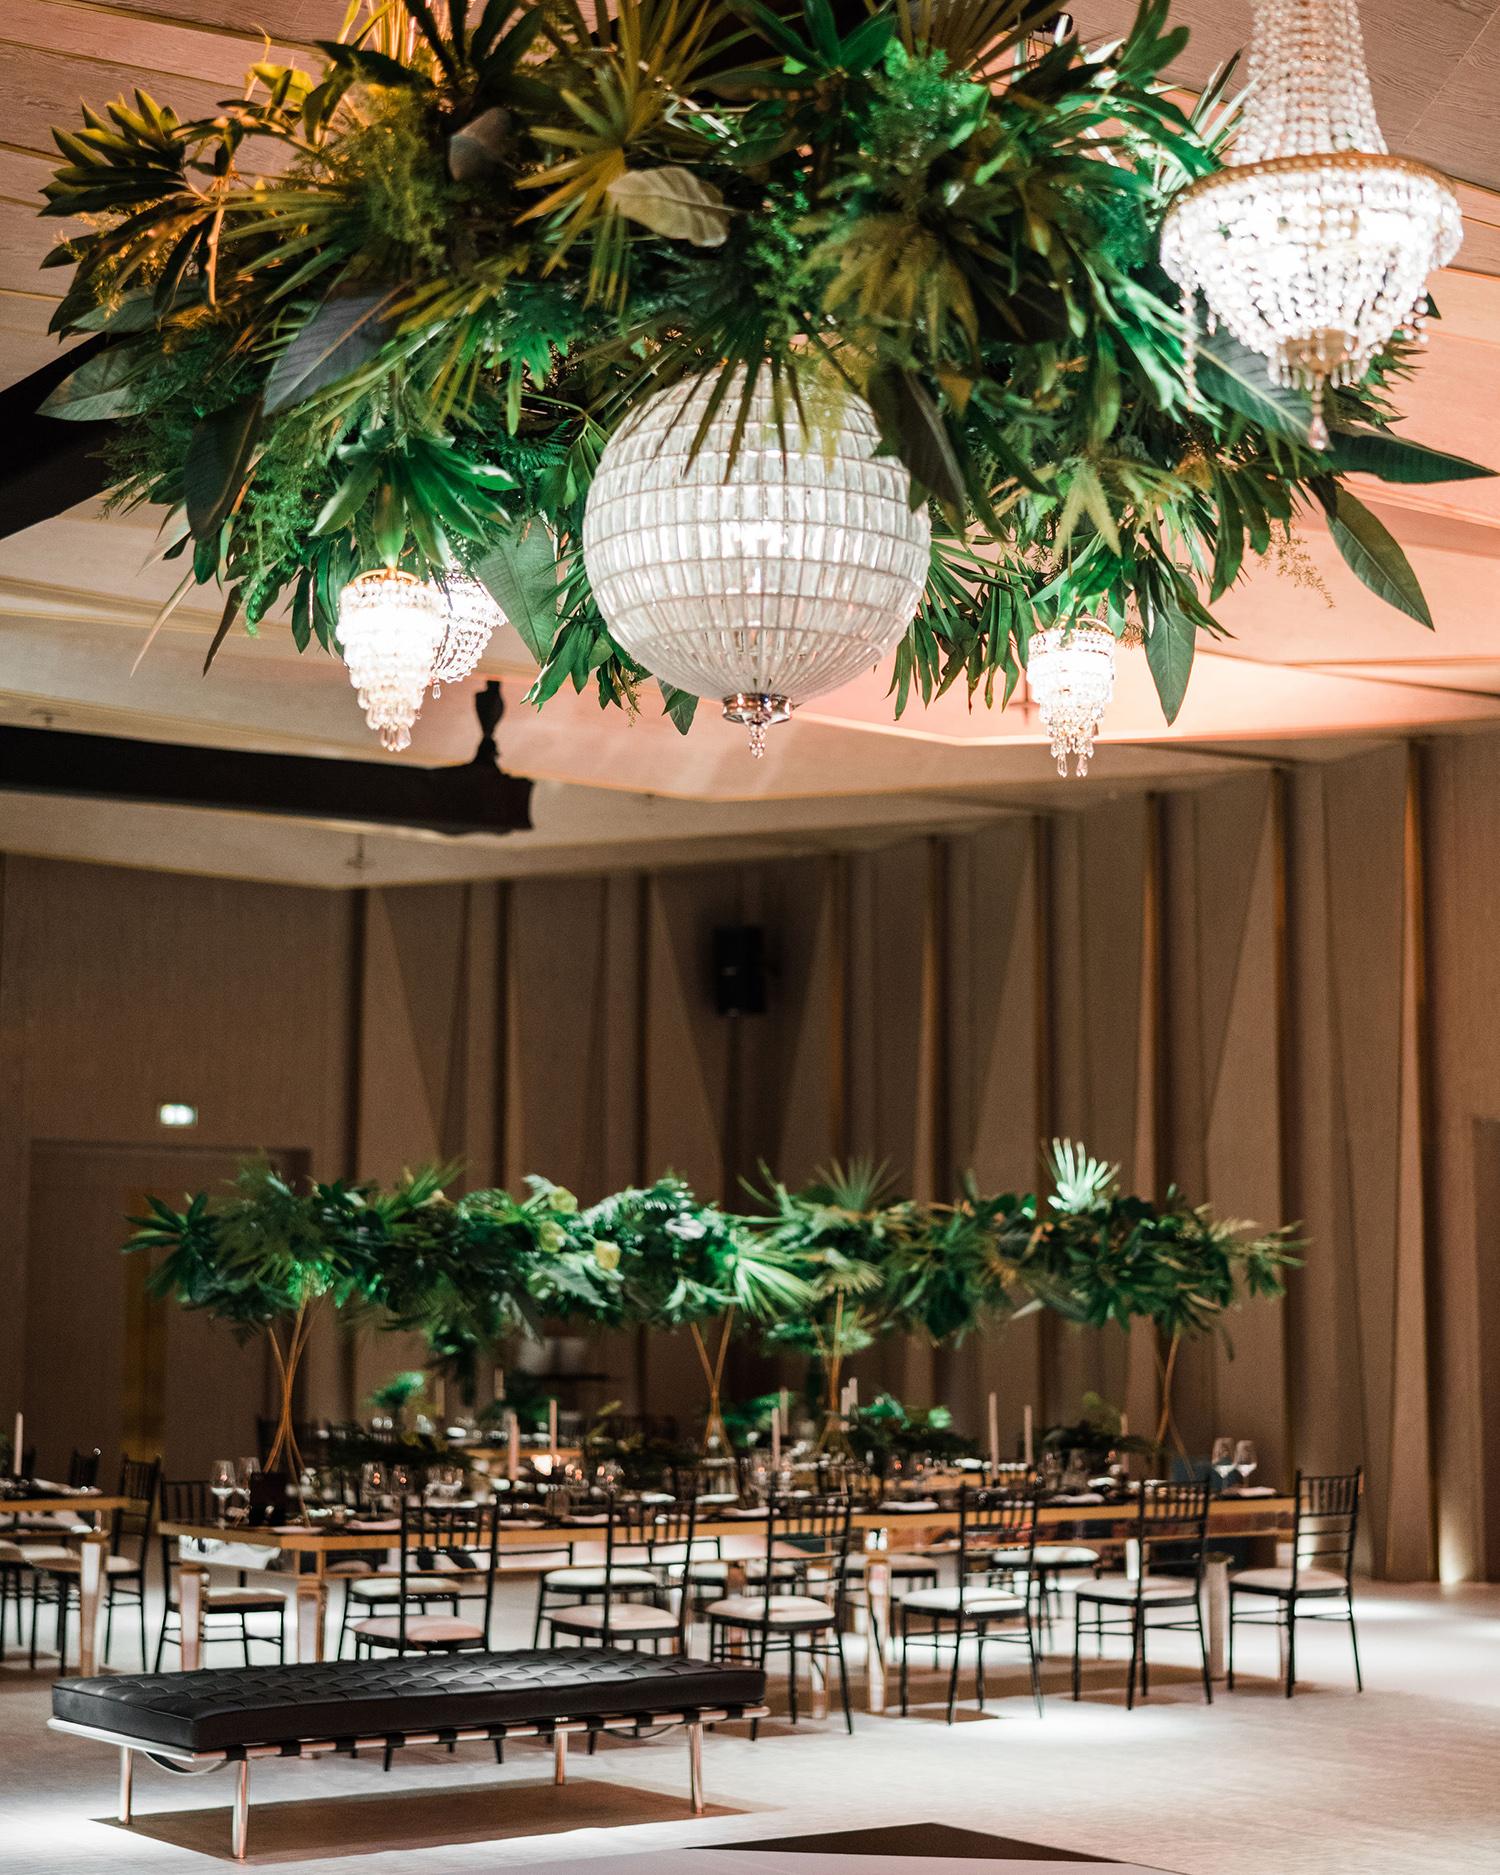 vanessa abidemi wedding indoor reception with hanging greenery